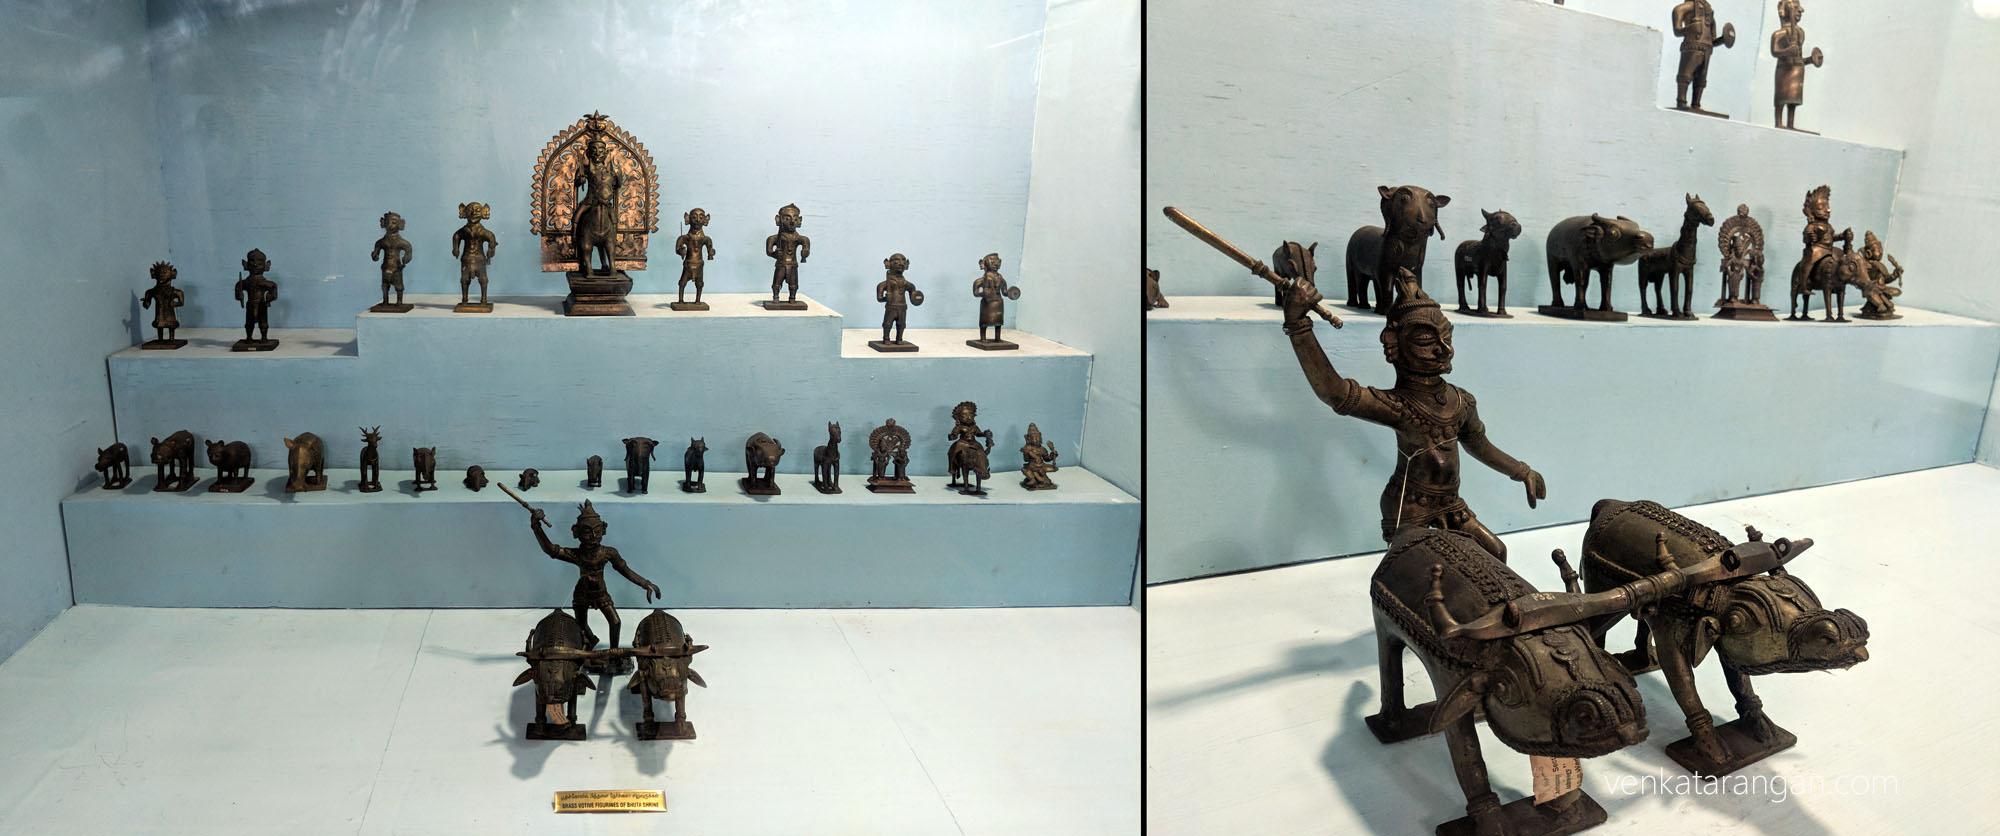 Votive offerings of Bhootha Shrine-South Canara, Karnataka (பூதக் கோவில் நேர்ச்சைப் பொருள்கள்). Brass Figurines.